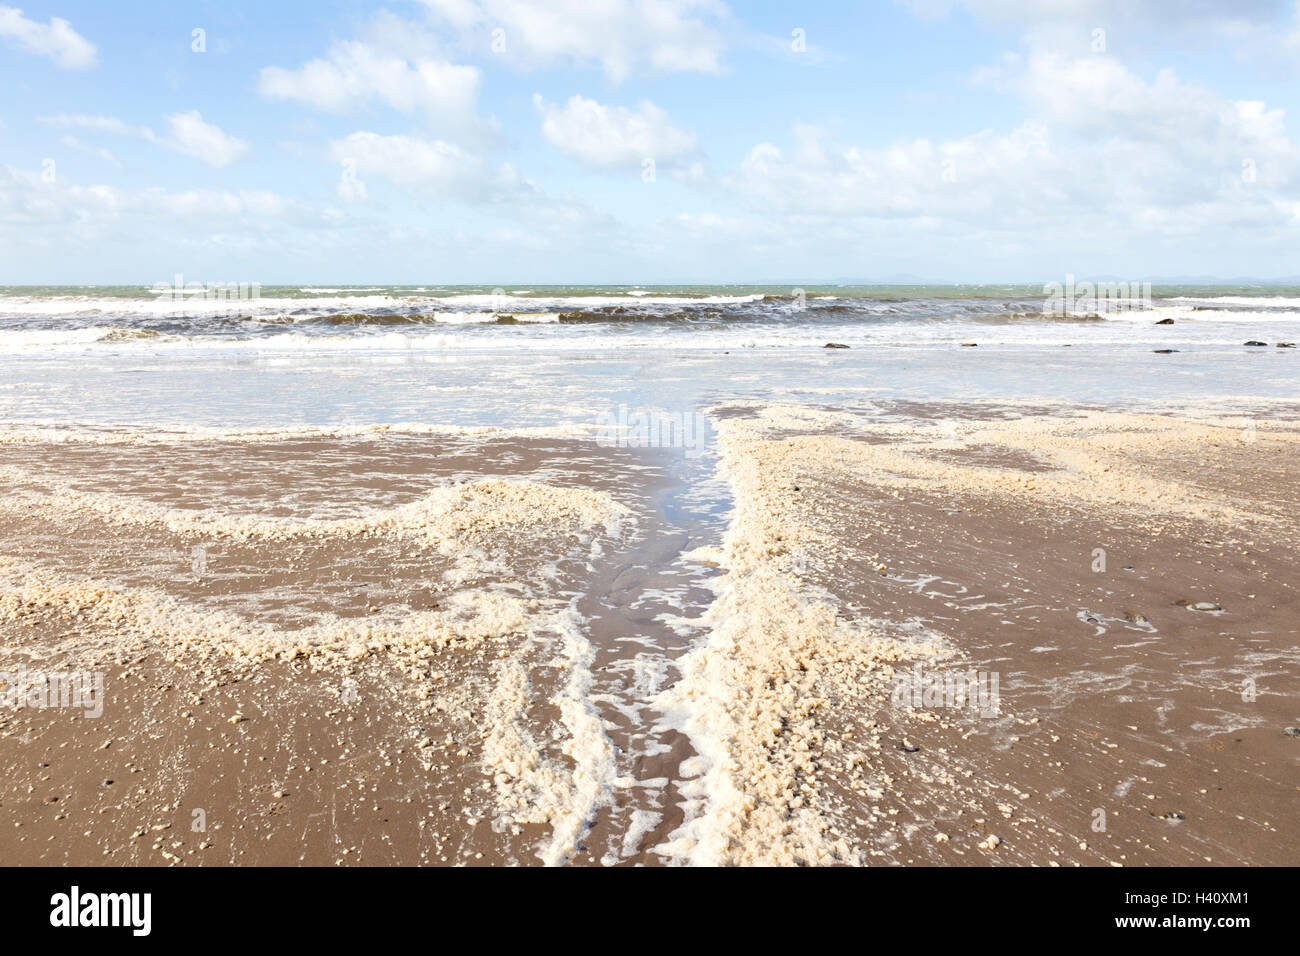 Sea foam or ocean foam on a British beach, Britain, UK - Stock Image